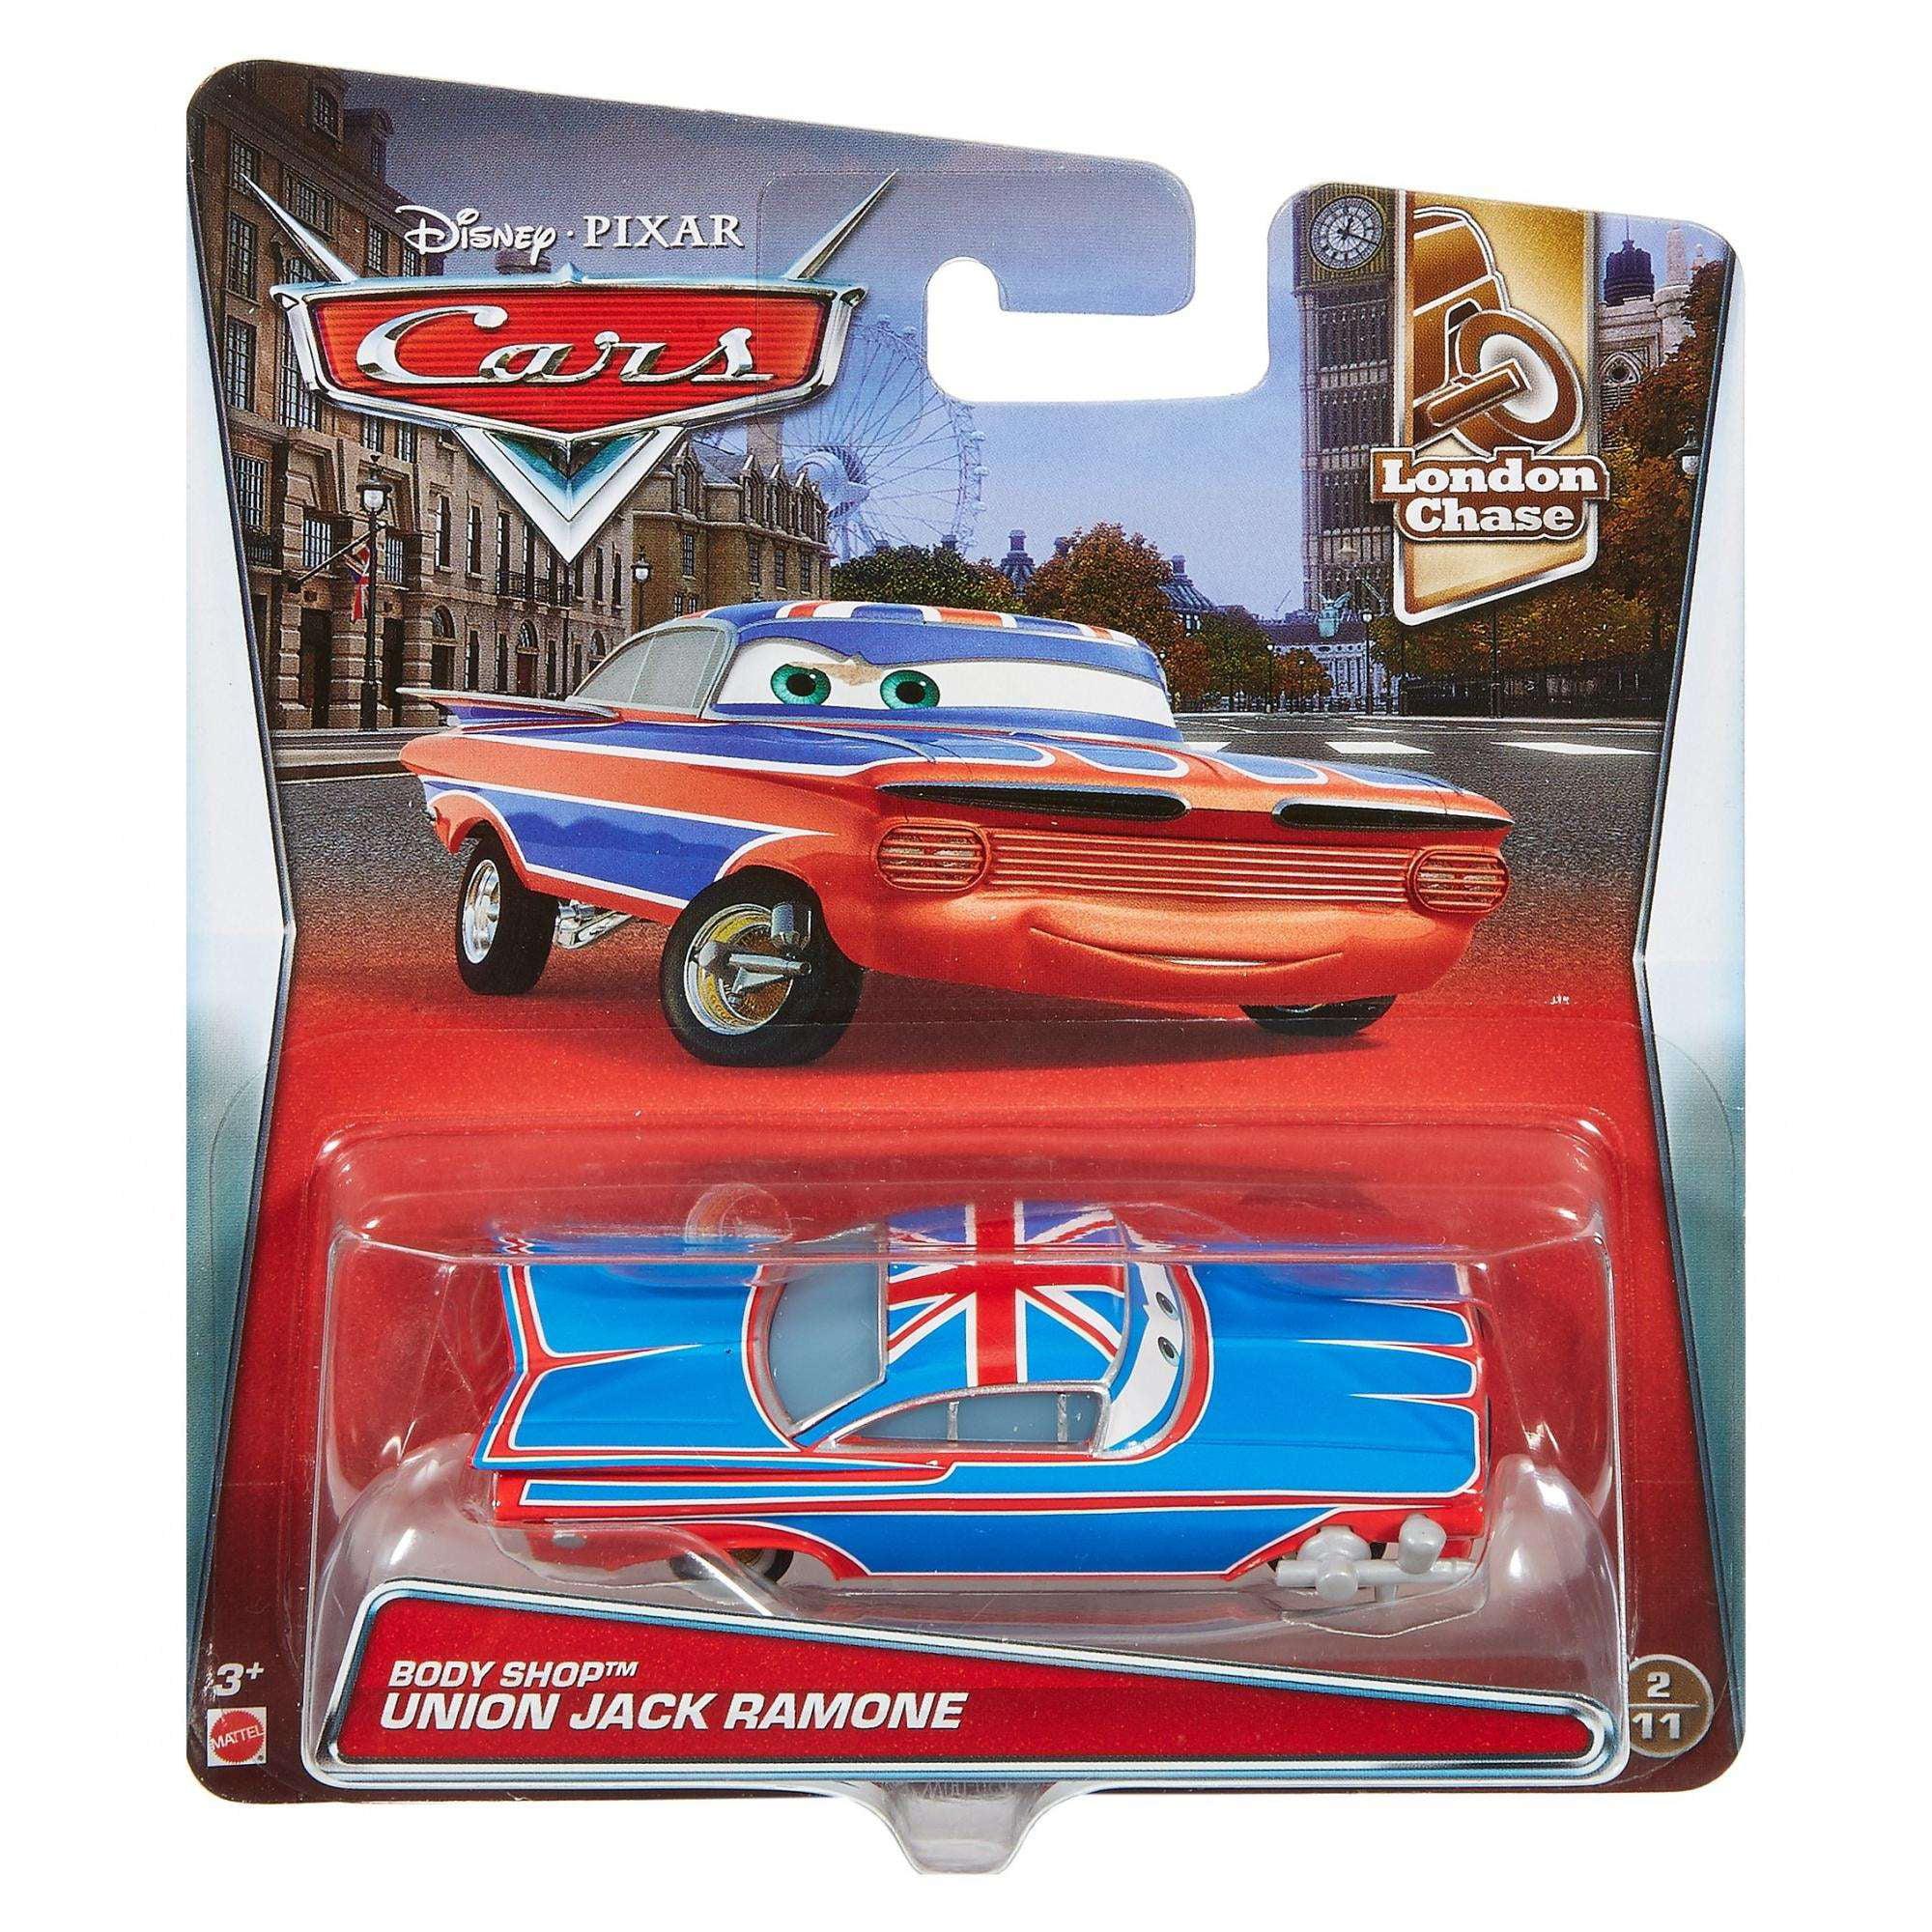 Disney Pixar Cars 2 Union Jack Ramone Diecast Toy Car 1:55 Boys Gift